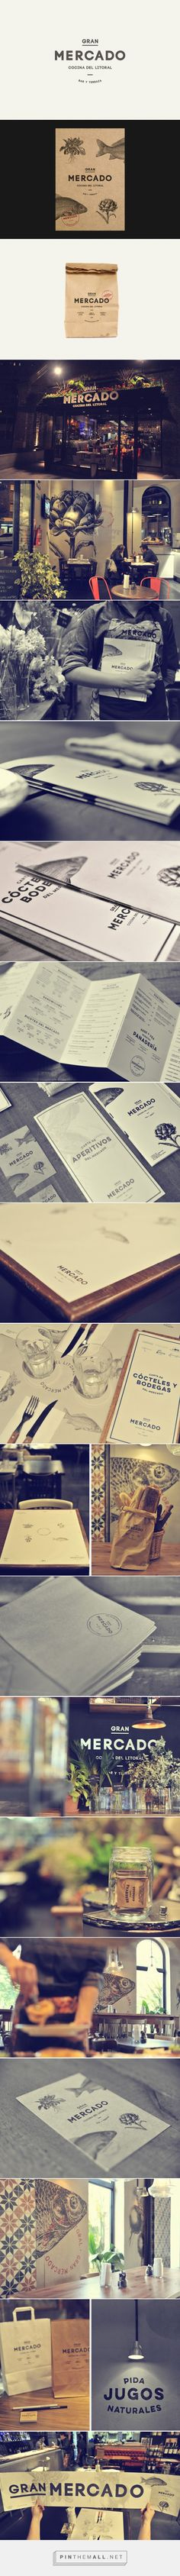 Gran Mercado on Behance   Fivestar Branding – Design and Branding Agency & Inspiration Gallery